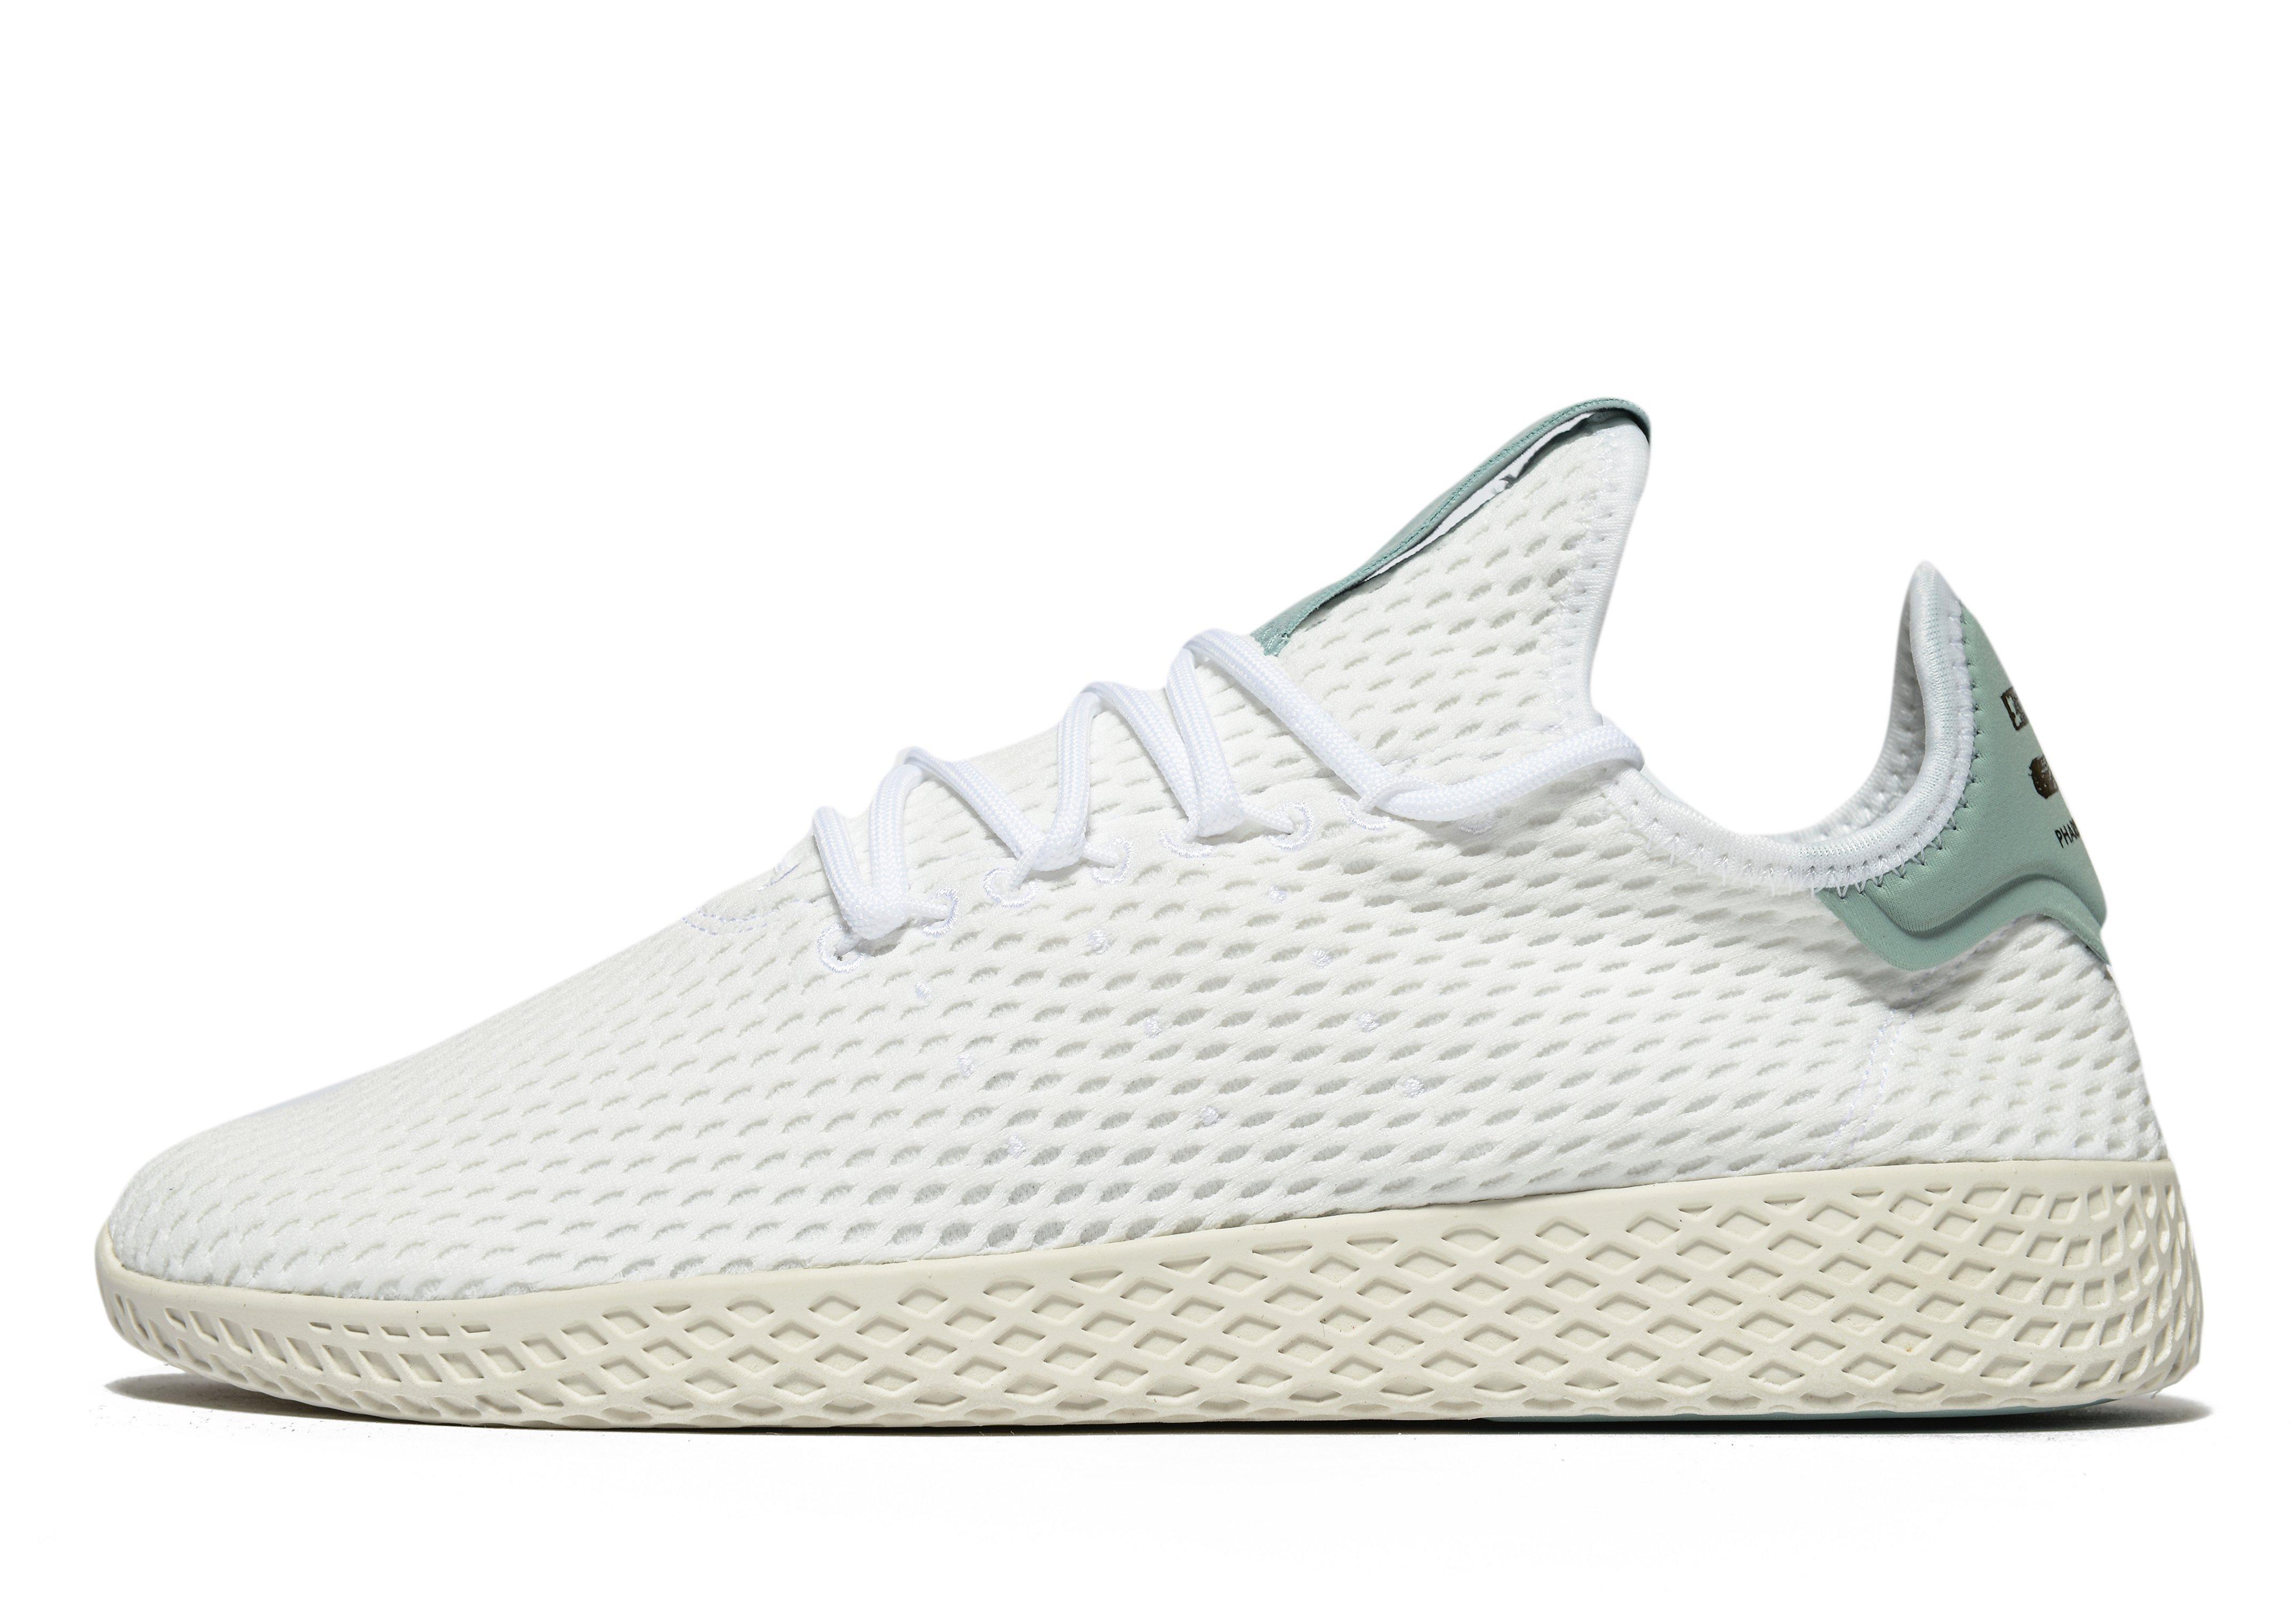 d271b754f ... inexpensive lyst adidas originals pharrell williams tennis hu in white  6964c 75e7f